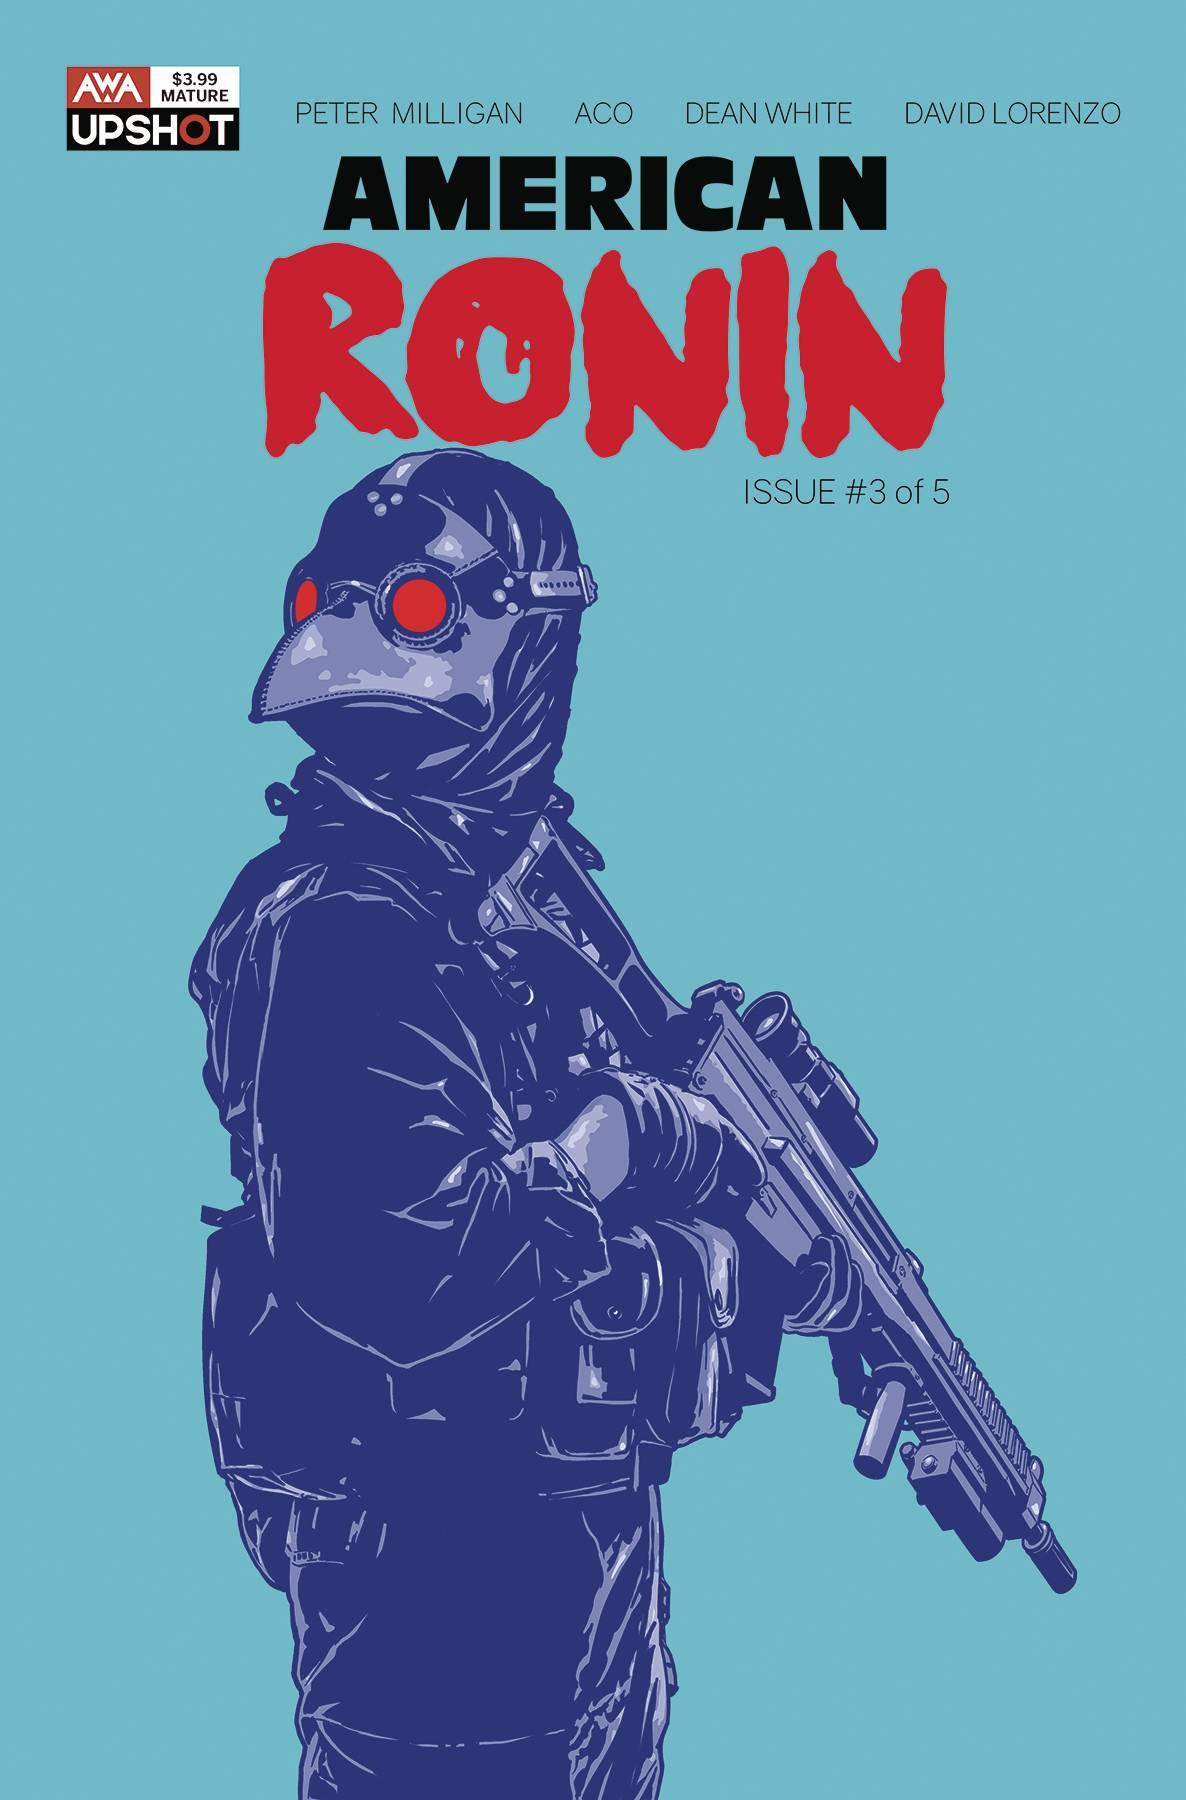 AMERICAN RONIN #3 (OF 5) (MR)